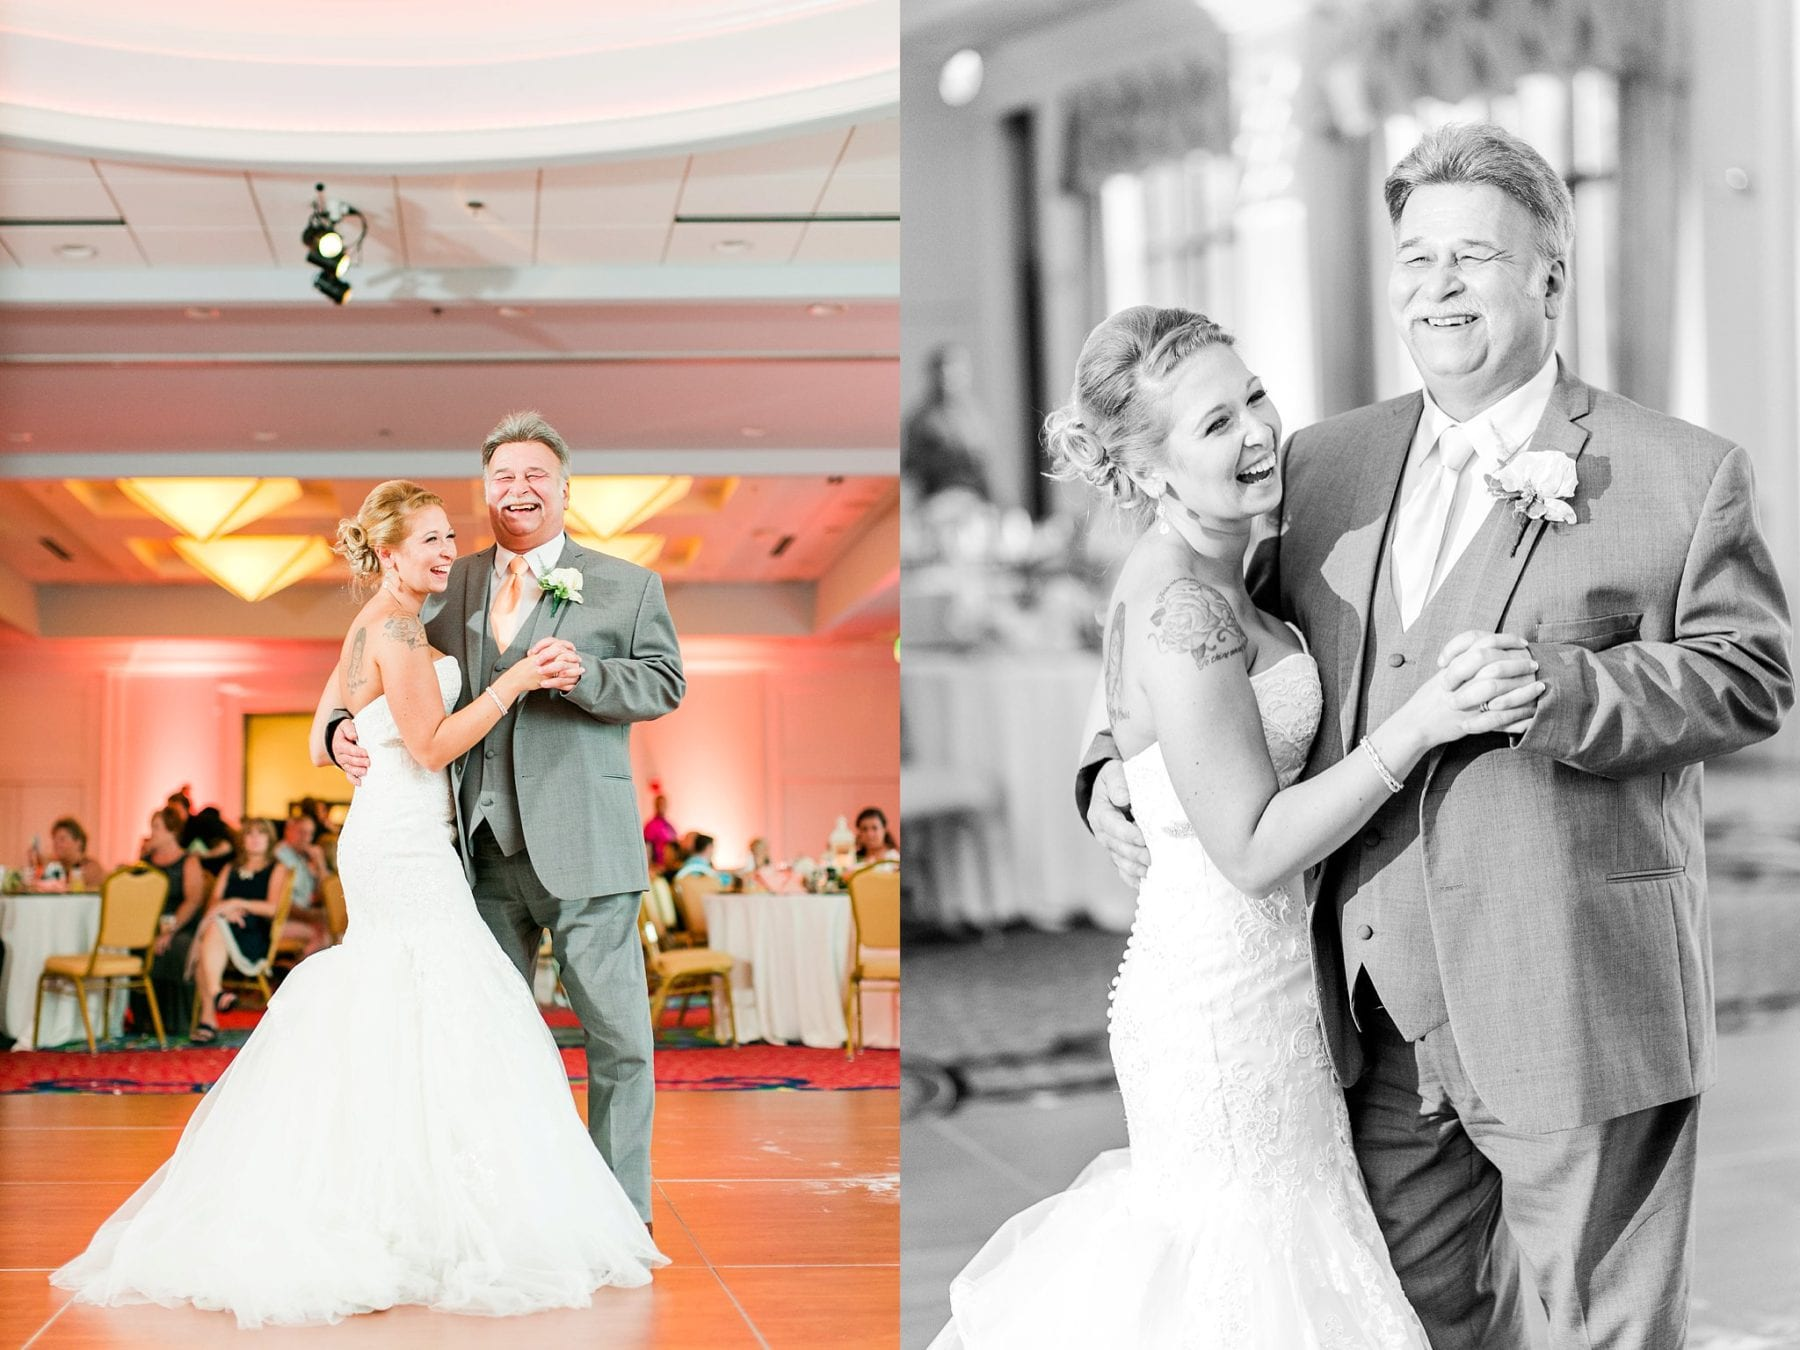 Waters Edge Wedding Photos Maryland Wedding Photographer Megan Kelsey Photography Katie & Conor-589.JPG